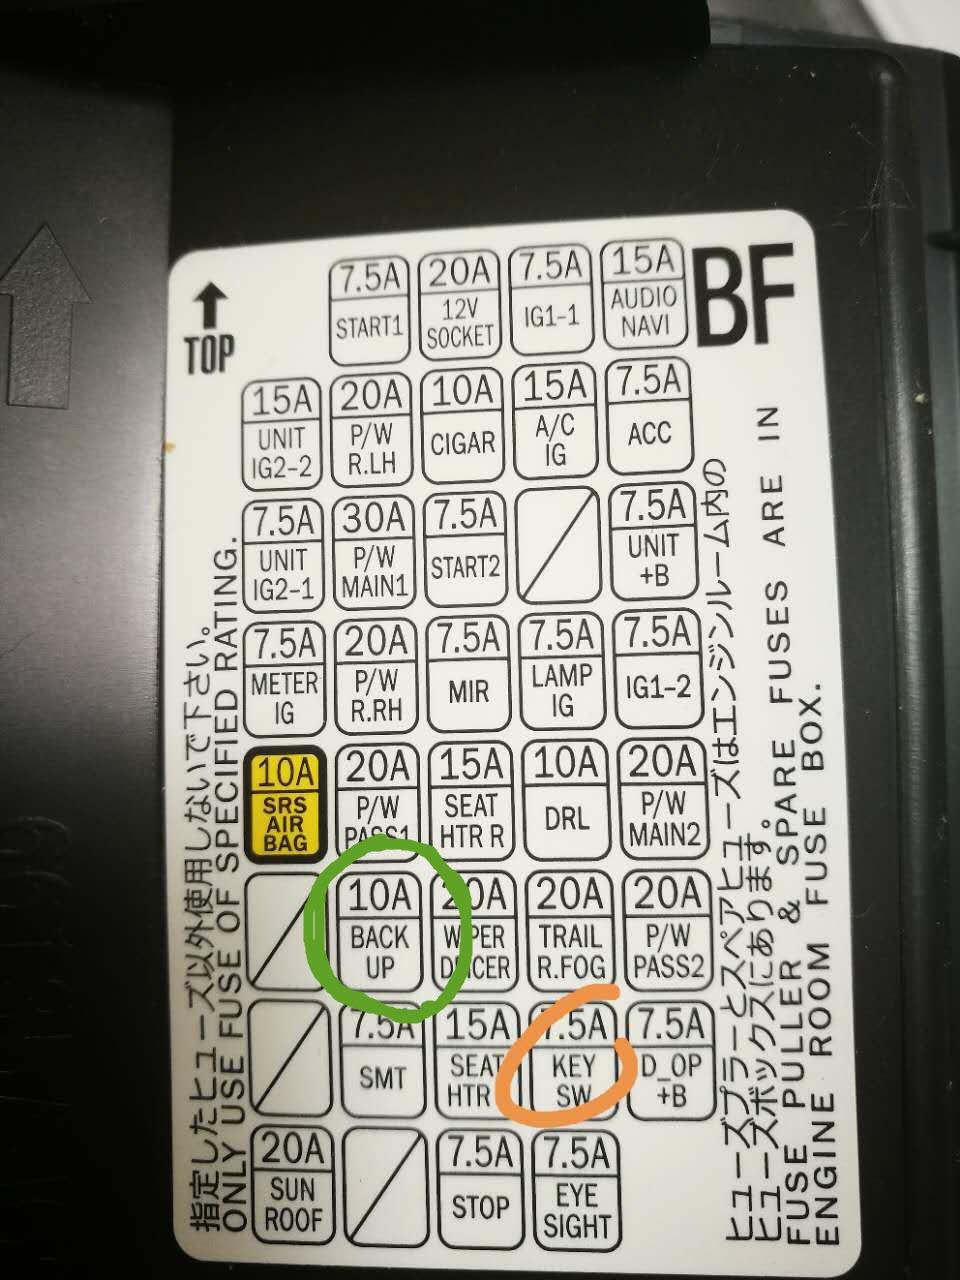 2015 Wrx Fuse Box Diagram Garage Door Opener Sensor Wiring Diagram Wiring Diagram Schematics